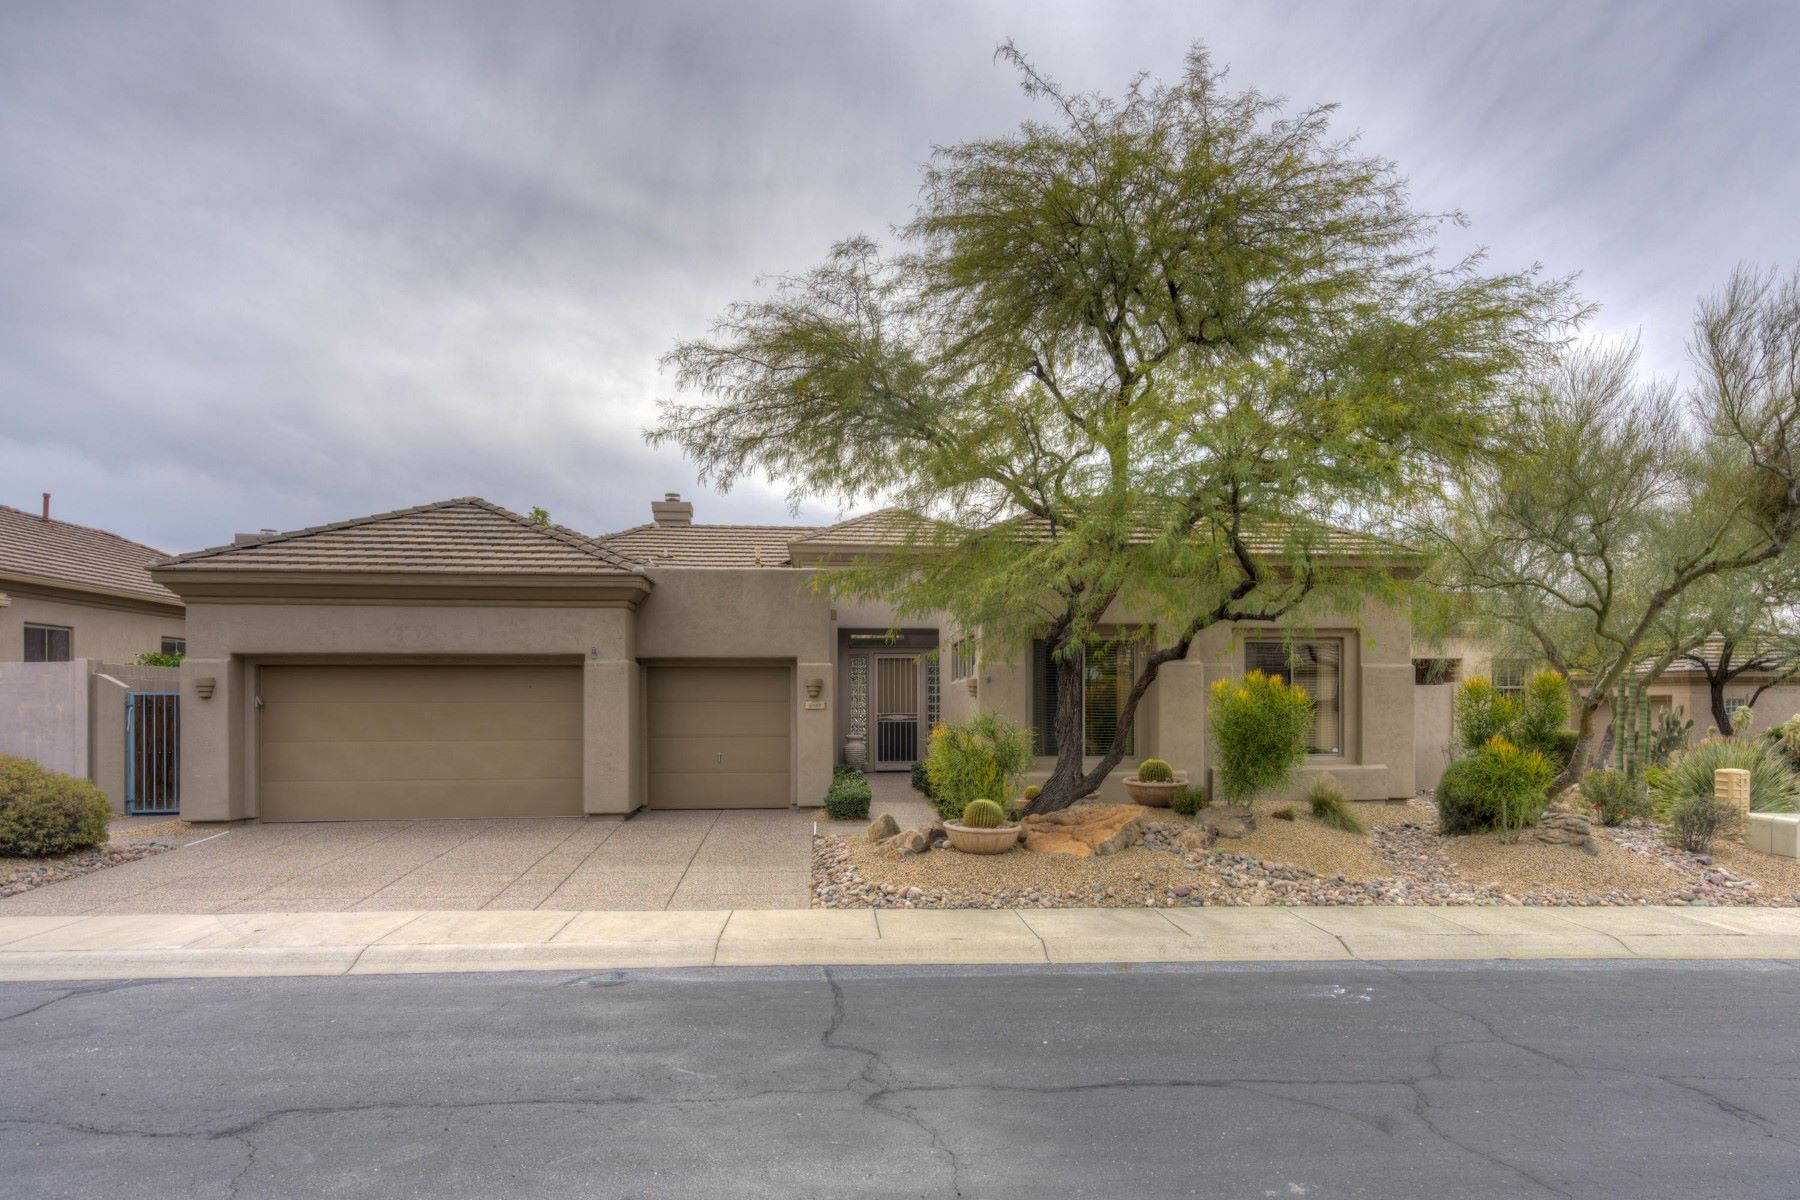 Single Family Home for Sale at Charming home in Scottsdale's Terravita 6347 E MARIOCA CIR W Scottsdale, Arizona, 85266 United States